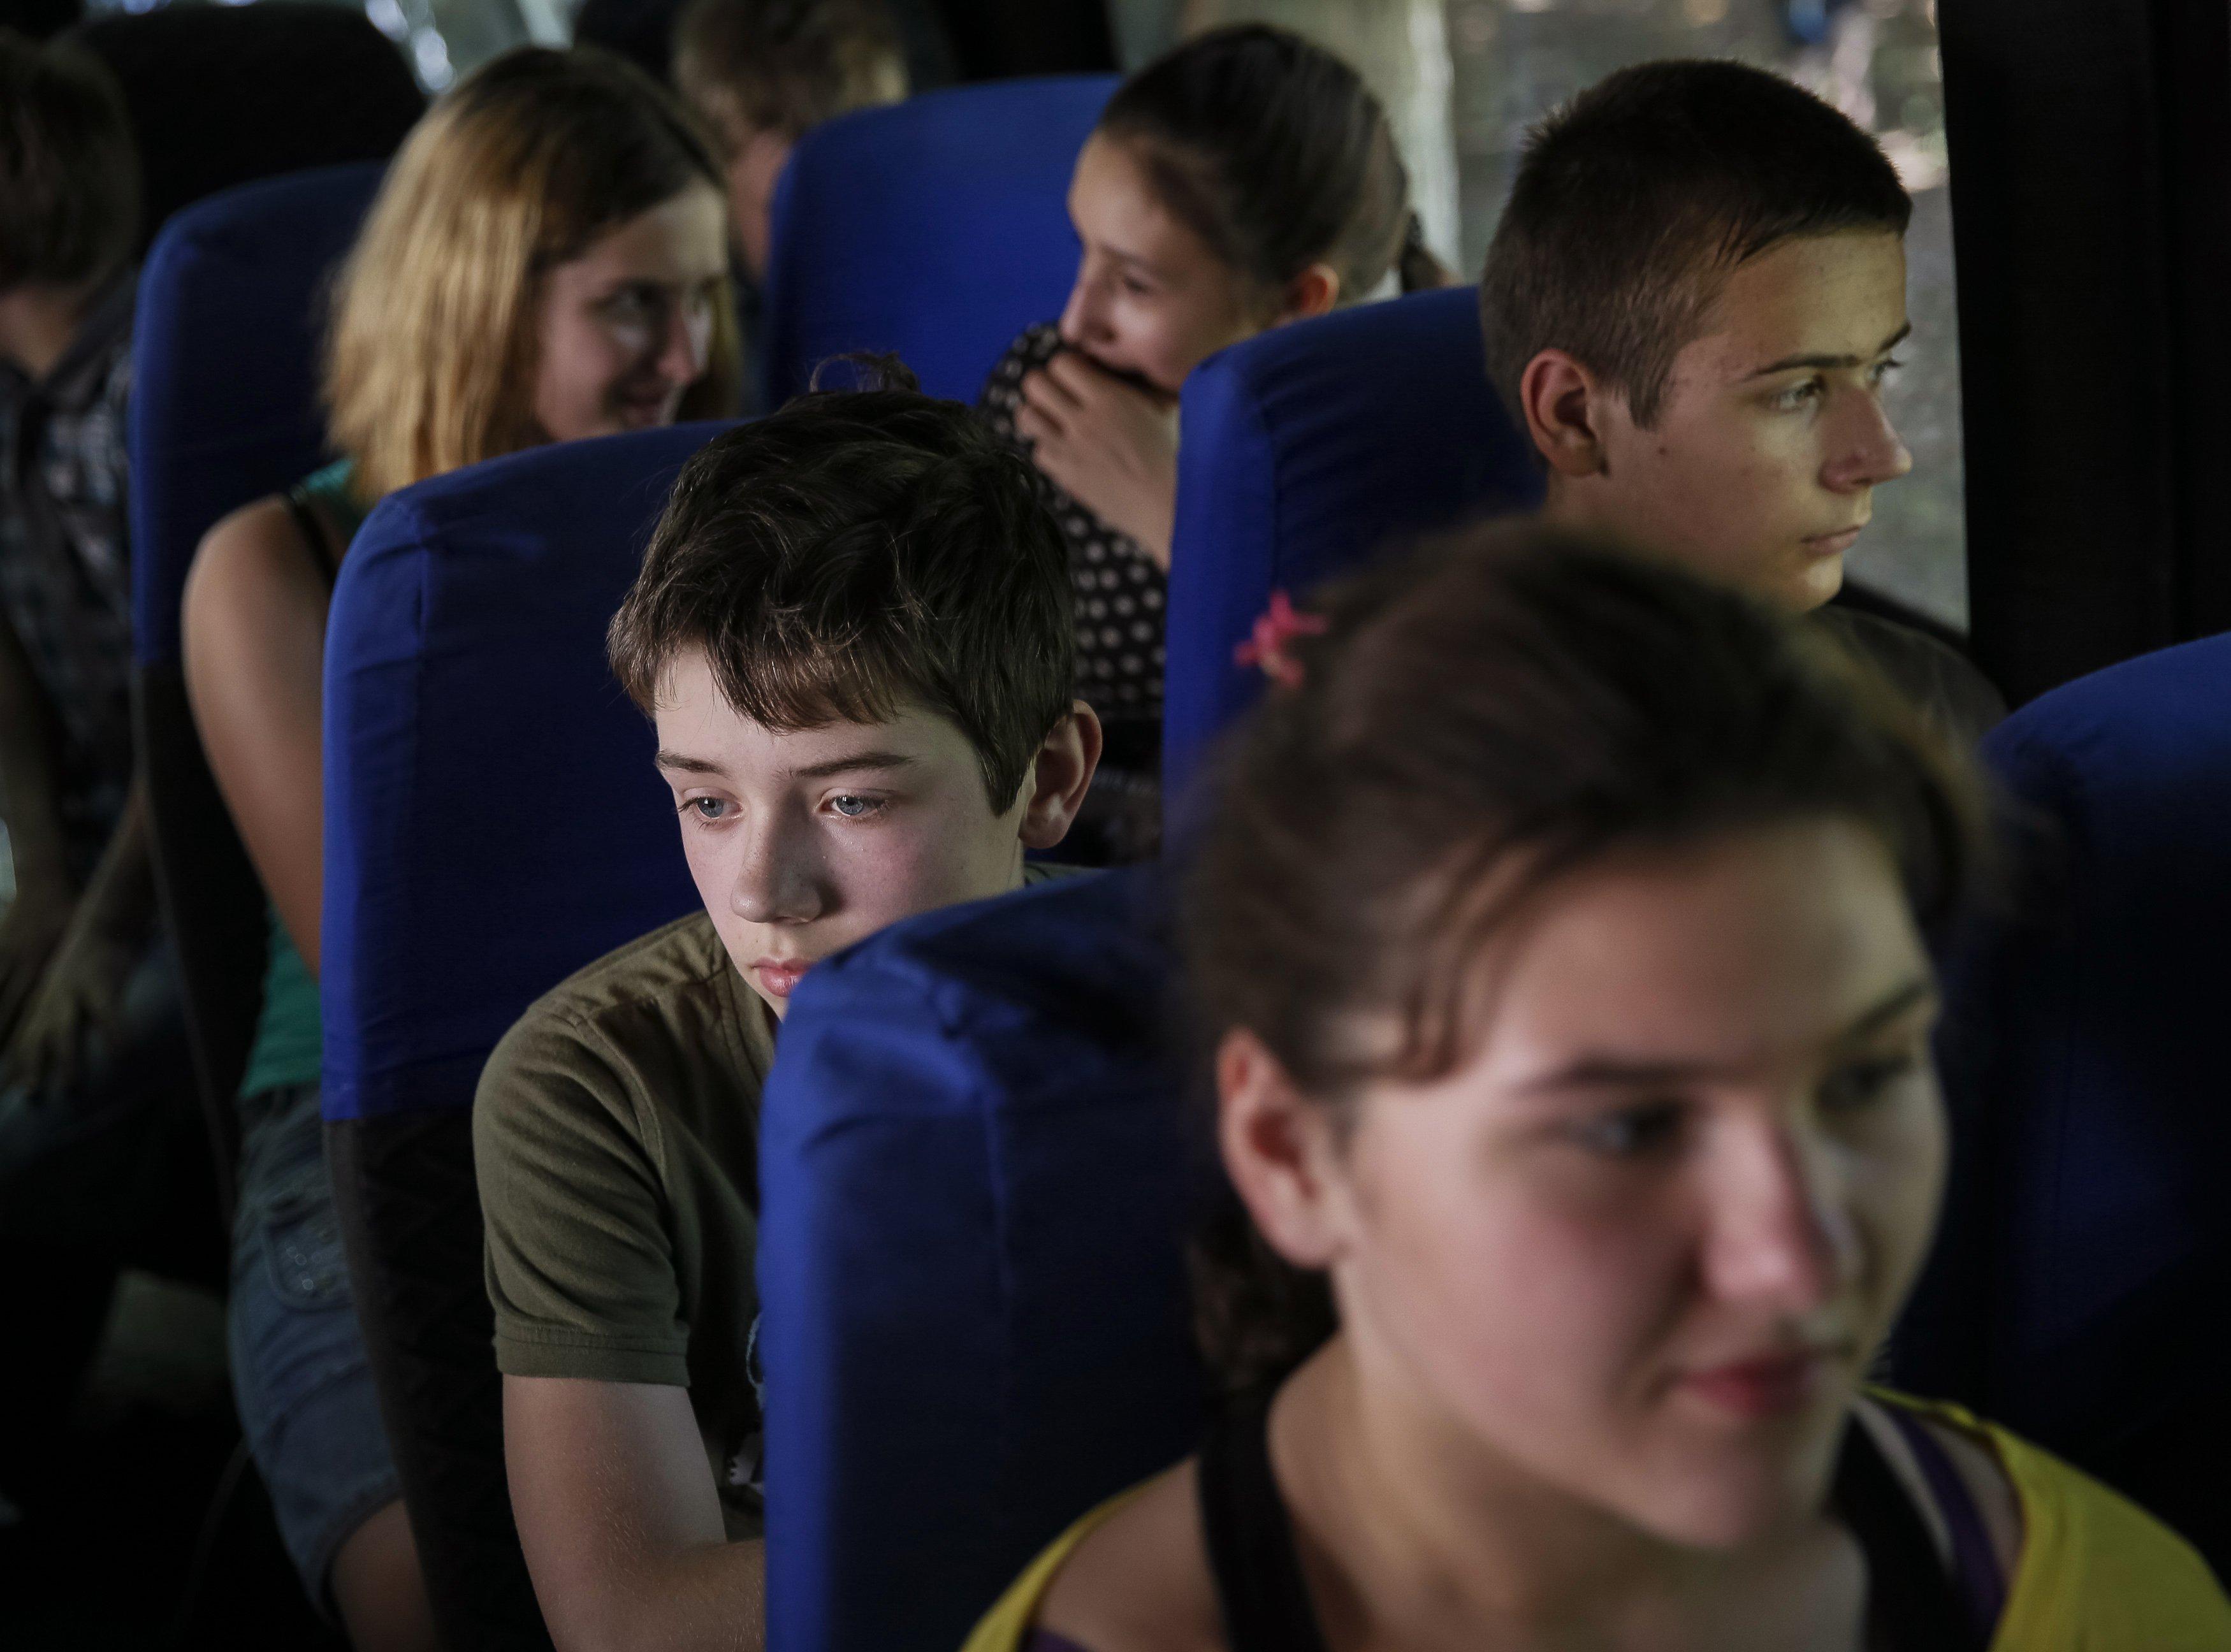 Children sit in a bus as they flee from fighting in Slaviansk, Ukraine on June 7, 2014.